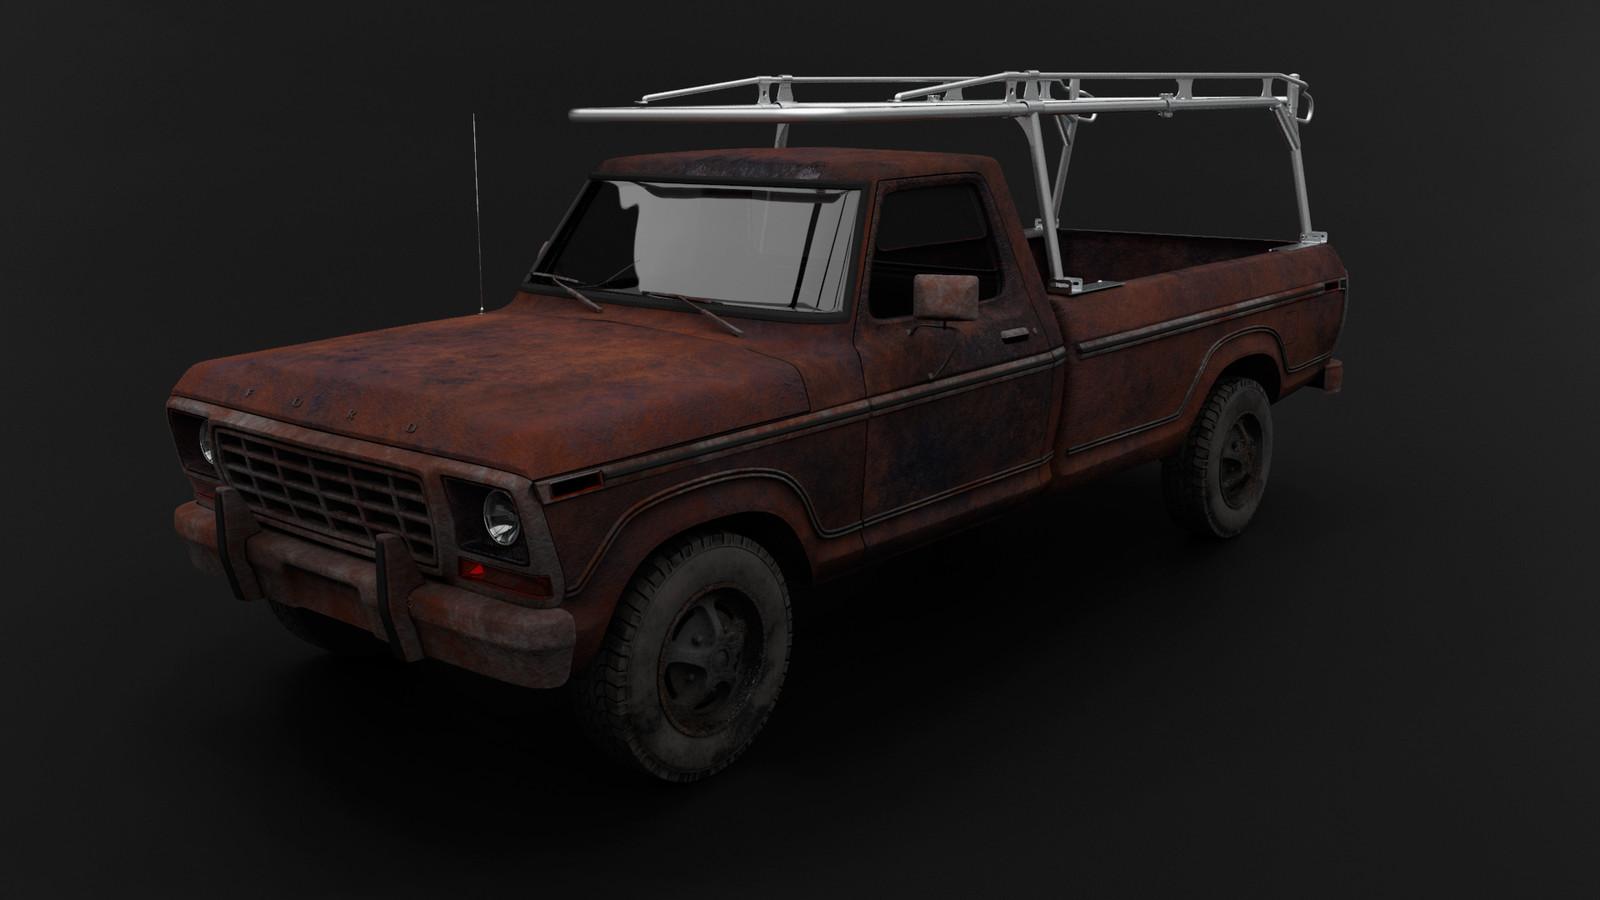 Kargo Master 3D Vehicle And Ladder Rack Renders